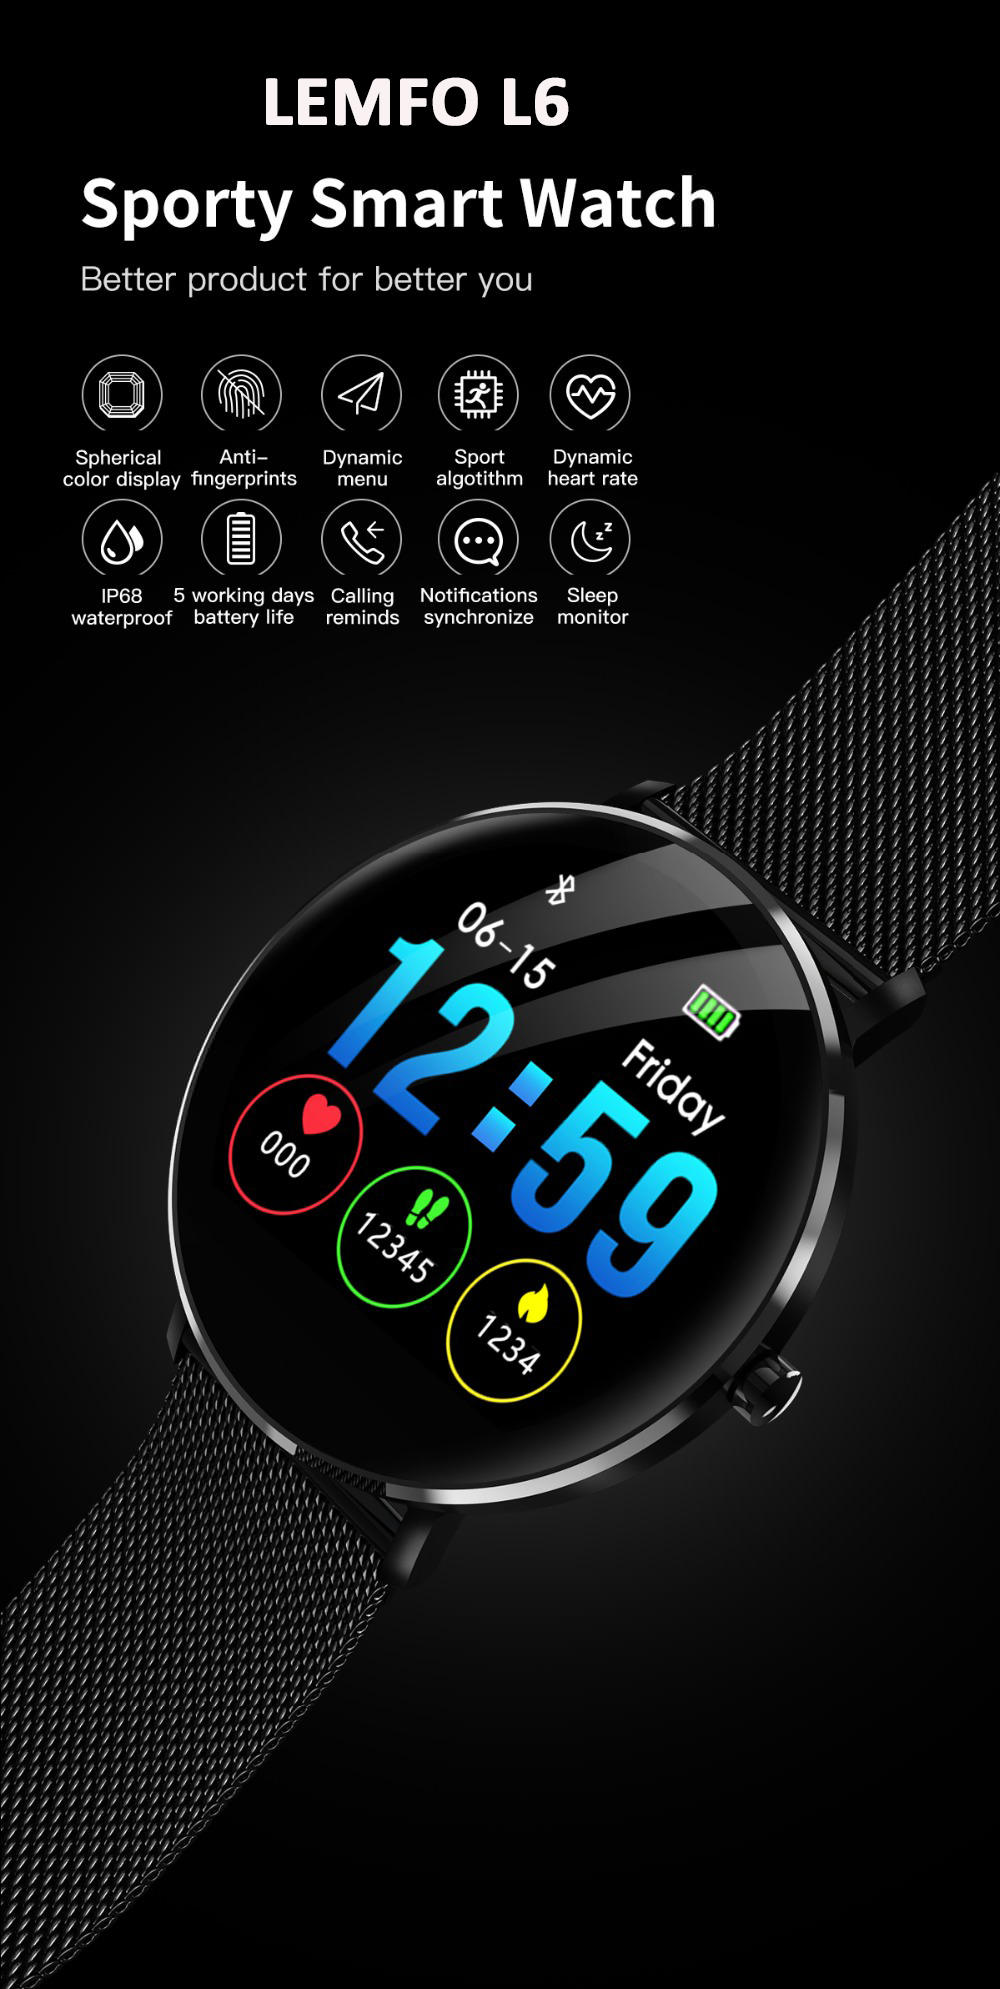 lemfo l6 sports smartwatch